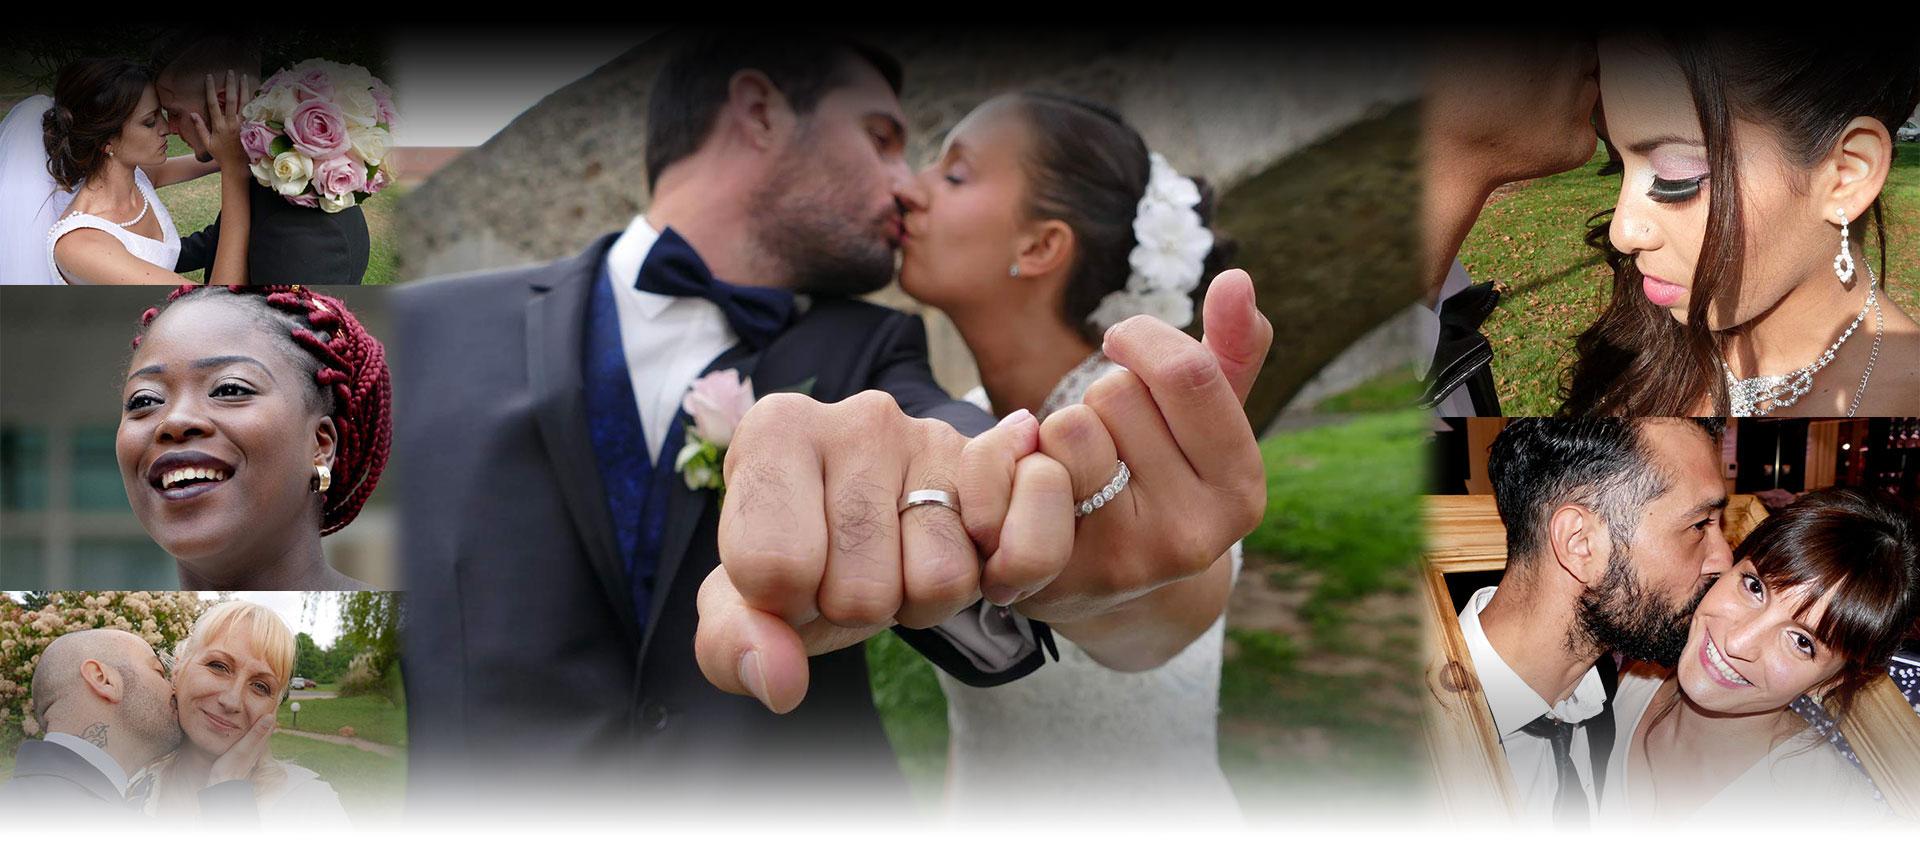 photographe mariage Lyon, photographe lyon, photographe de mariage Lyon, lyon photographe, gregory Cros